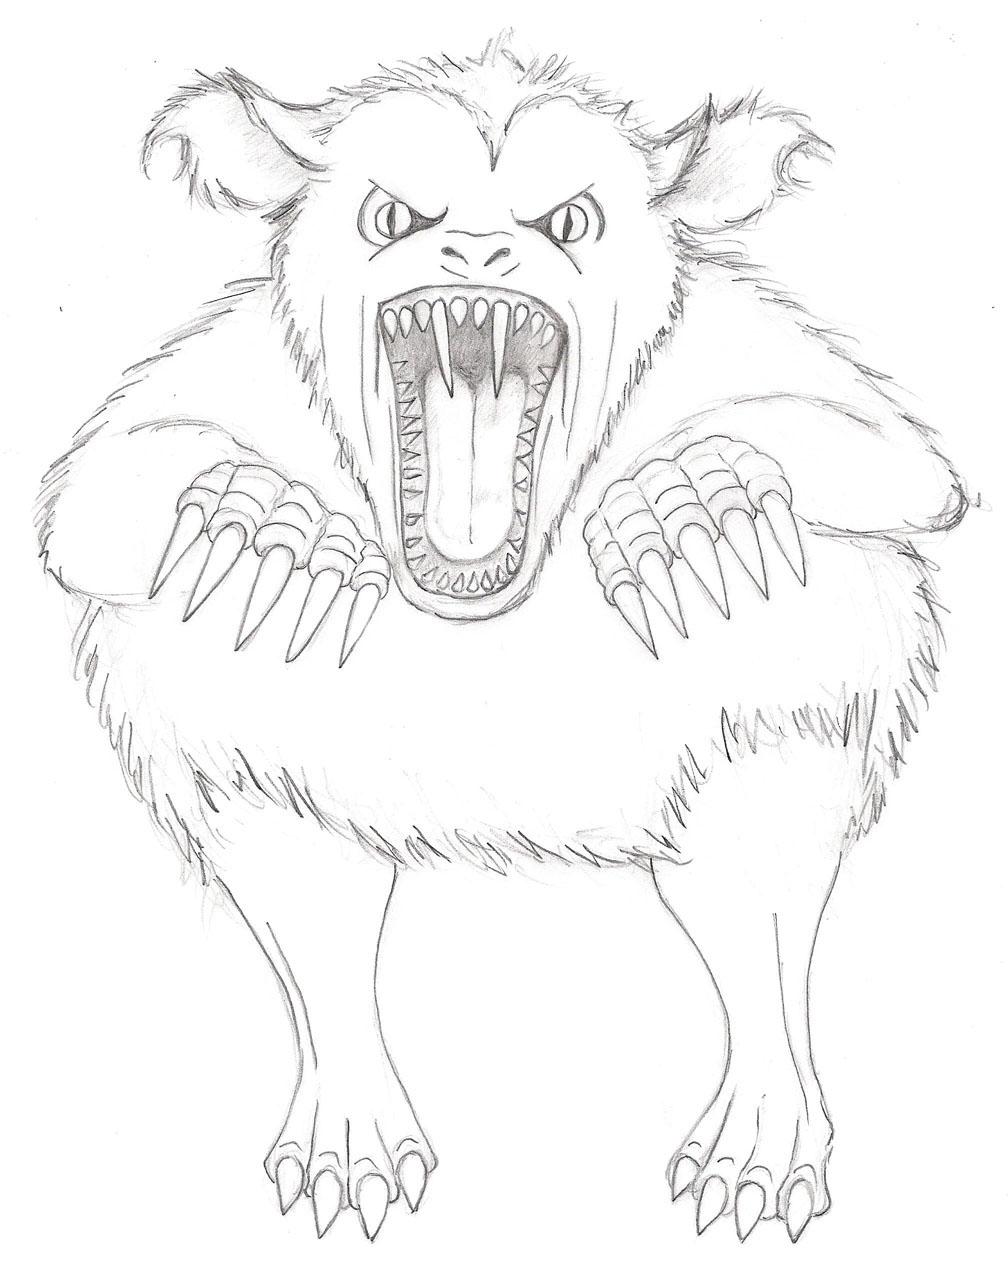 artist impression of the Burnell Beast